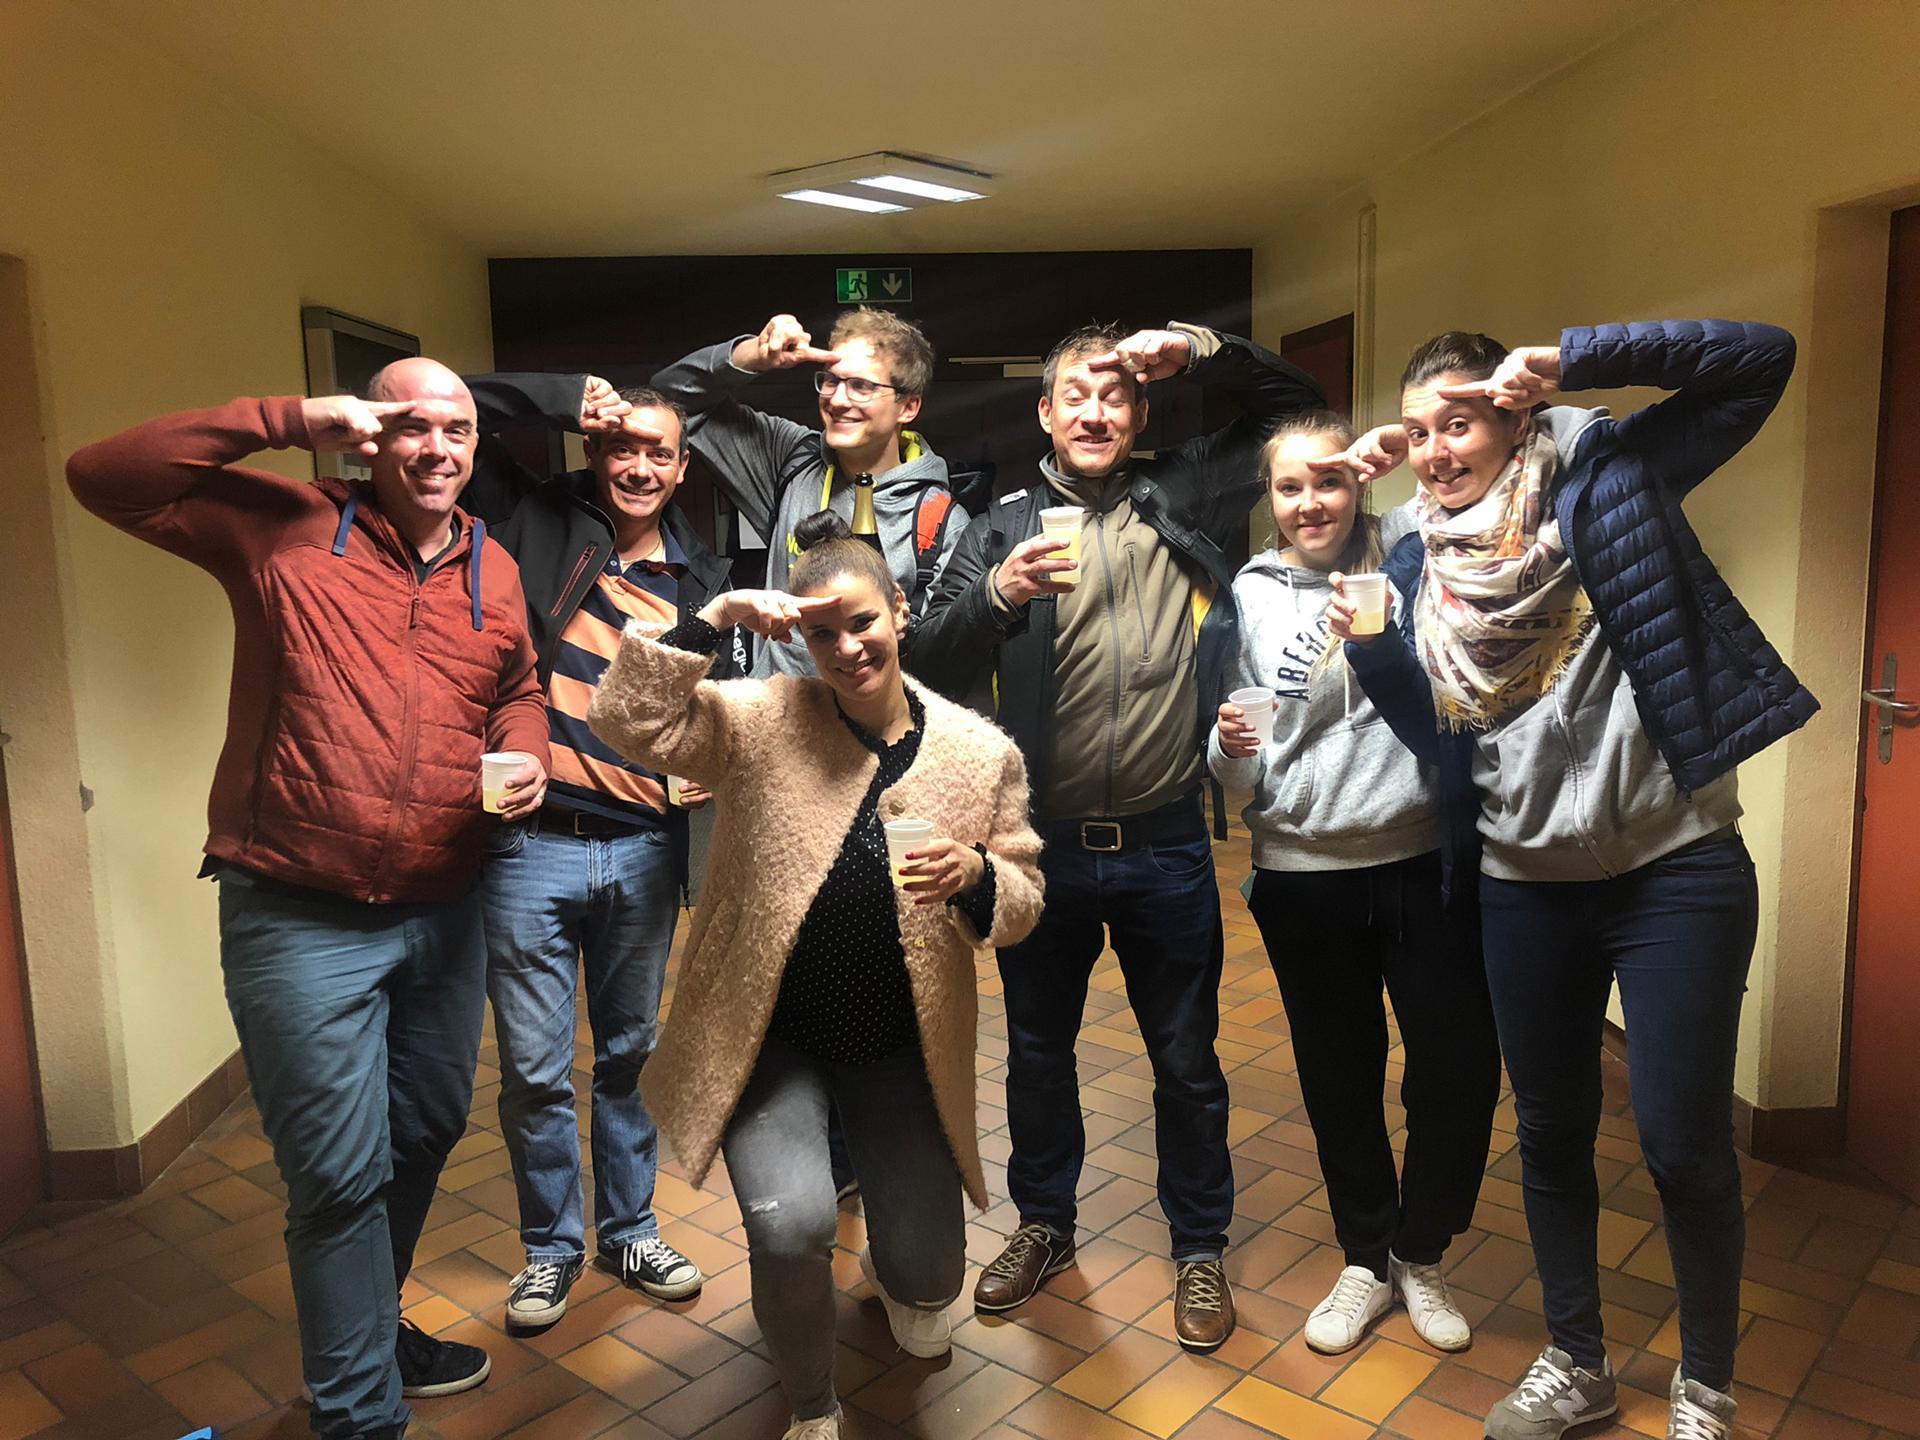 Genève Volley champion genevois en… relax mixte !